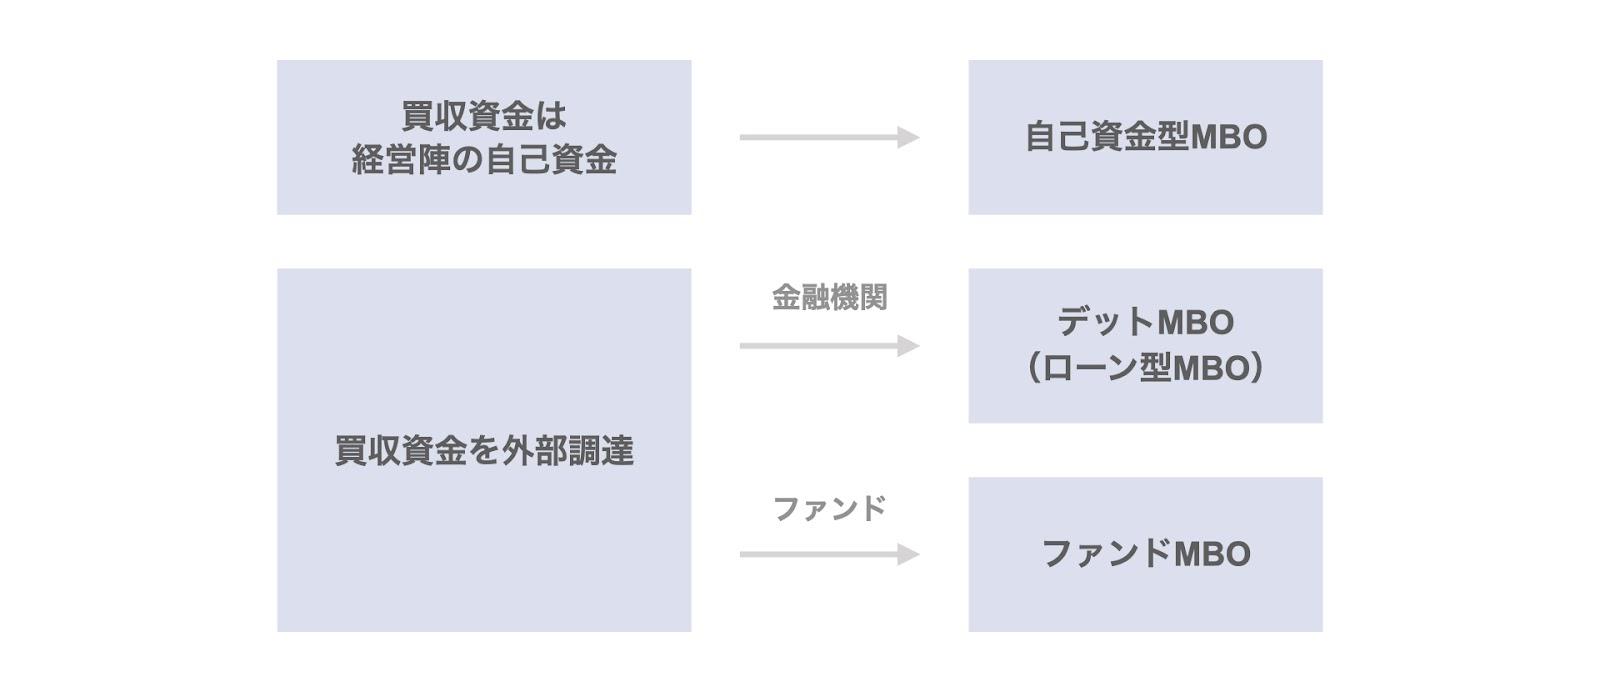 MBOの3類型